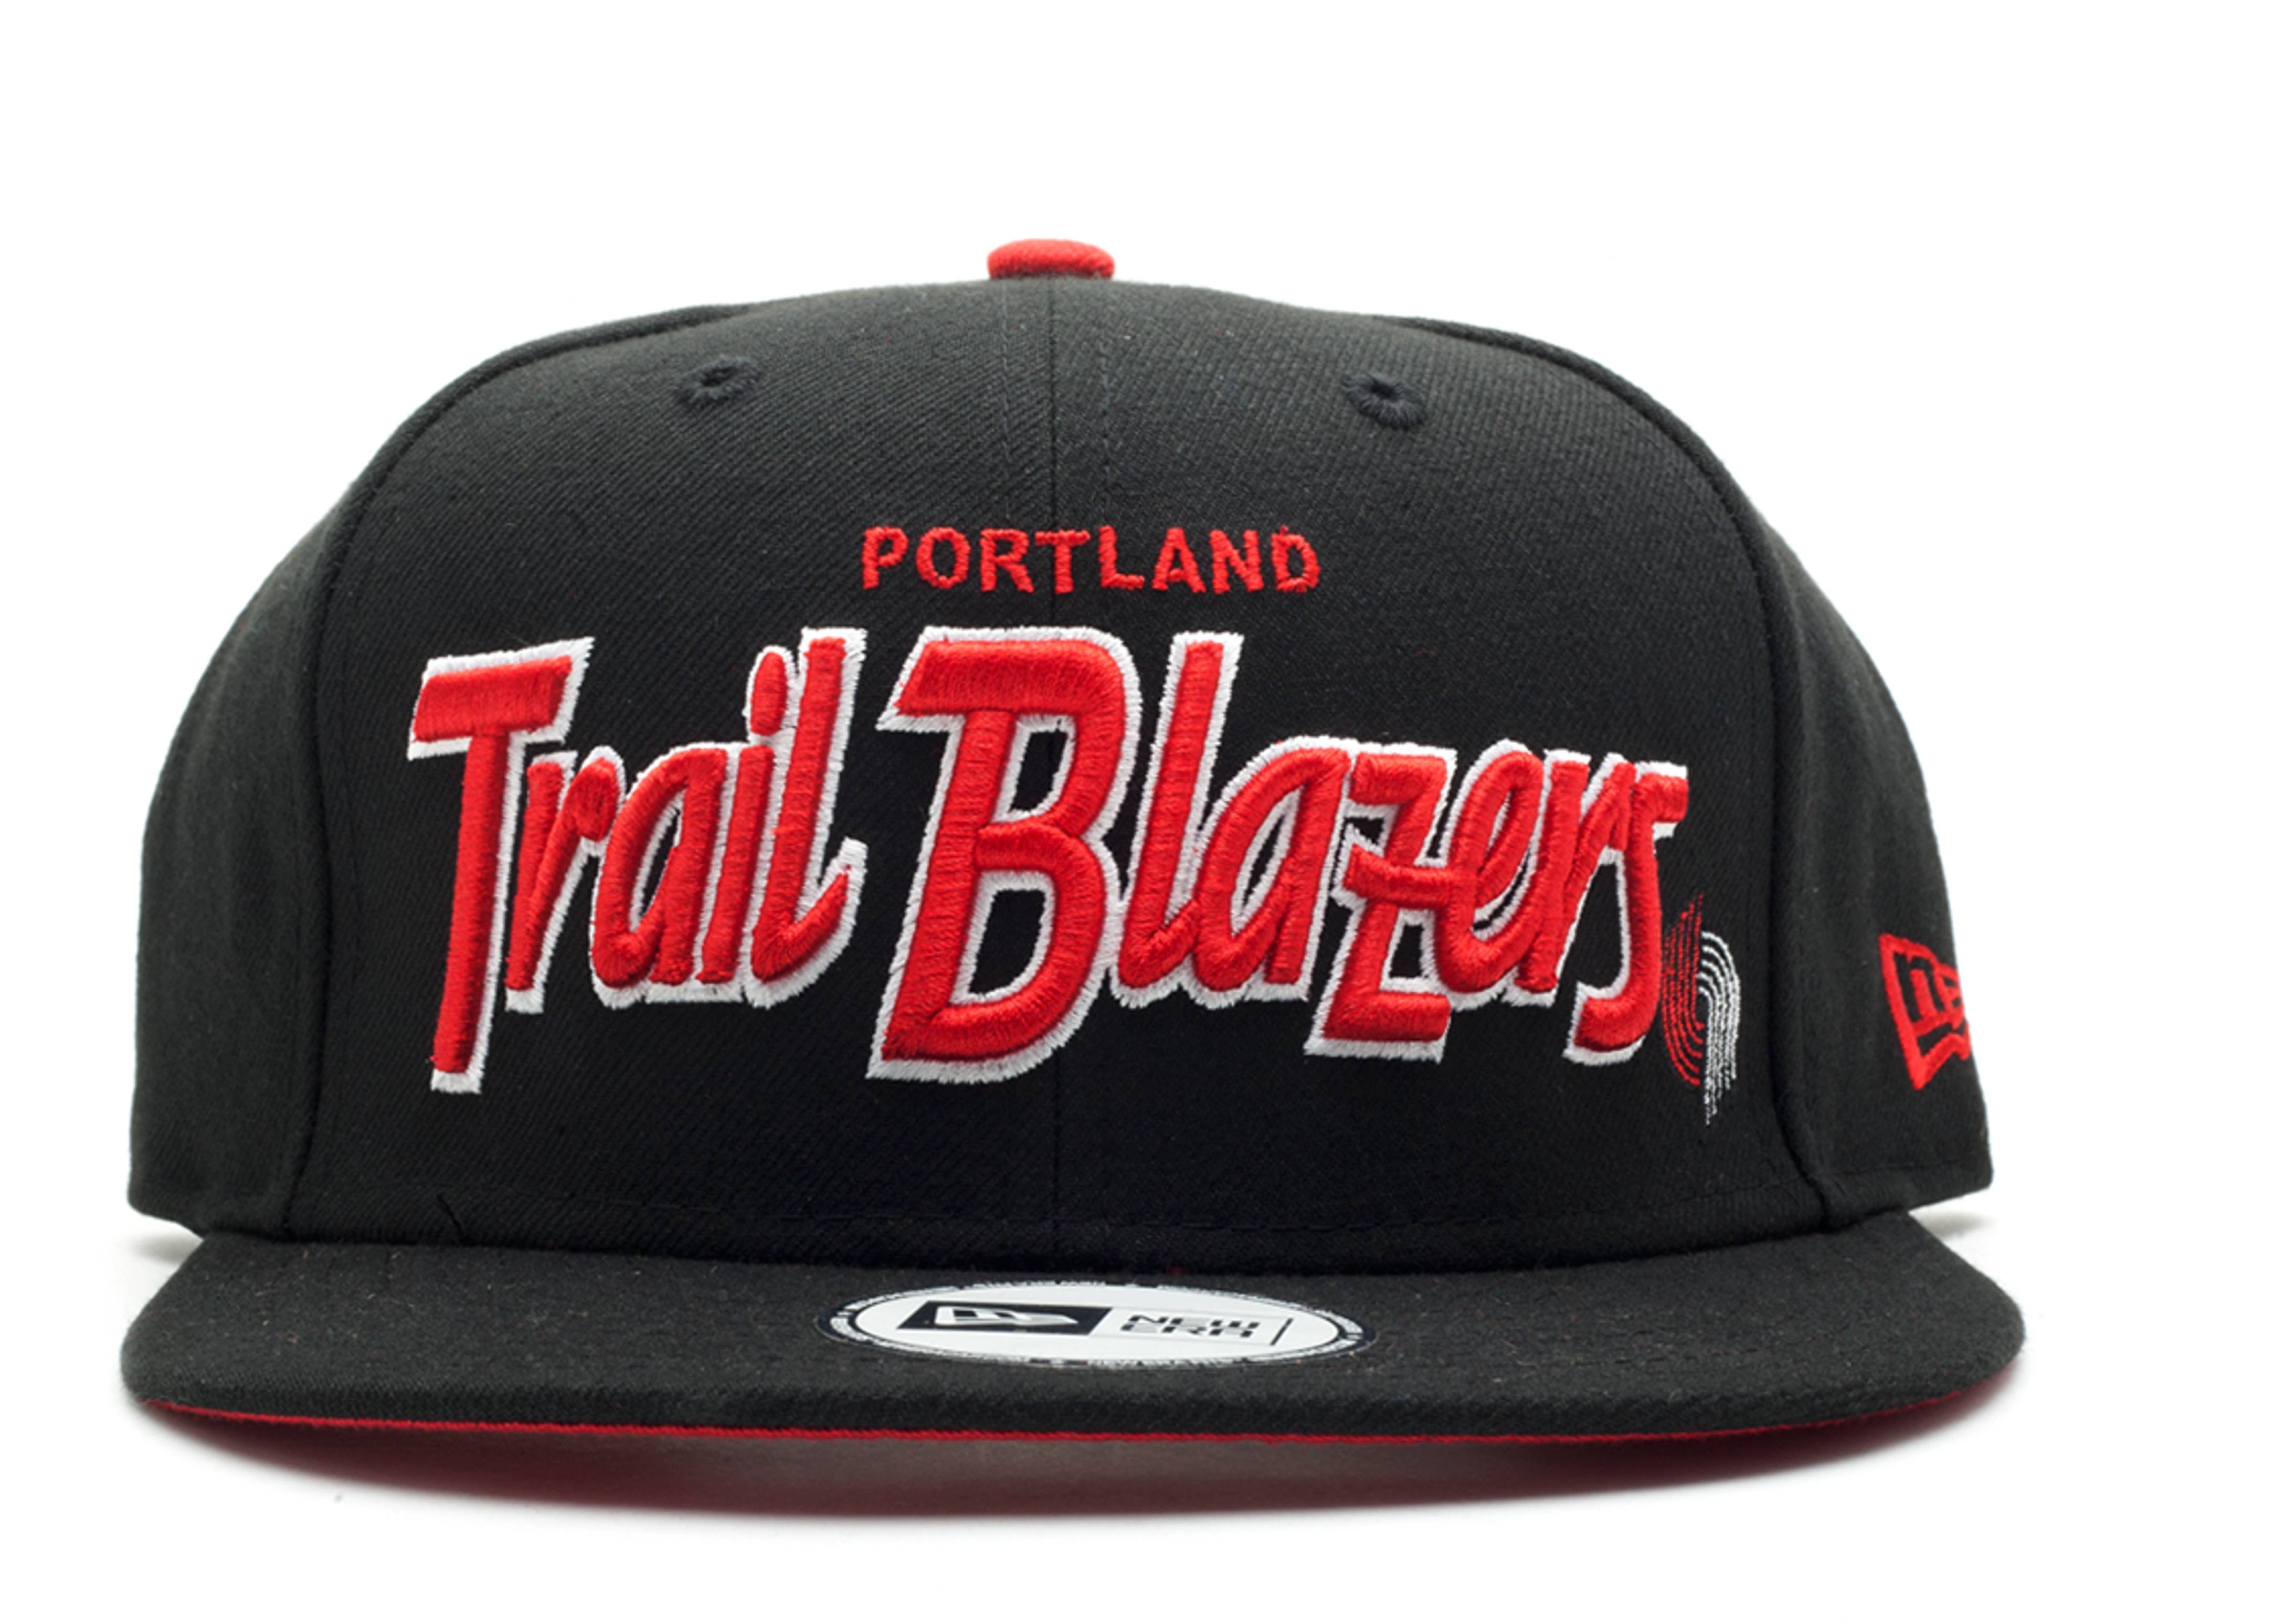 portland trail blazers snap-back